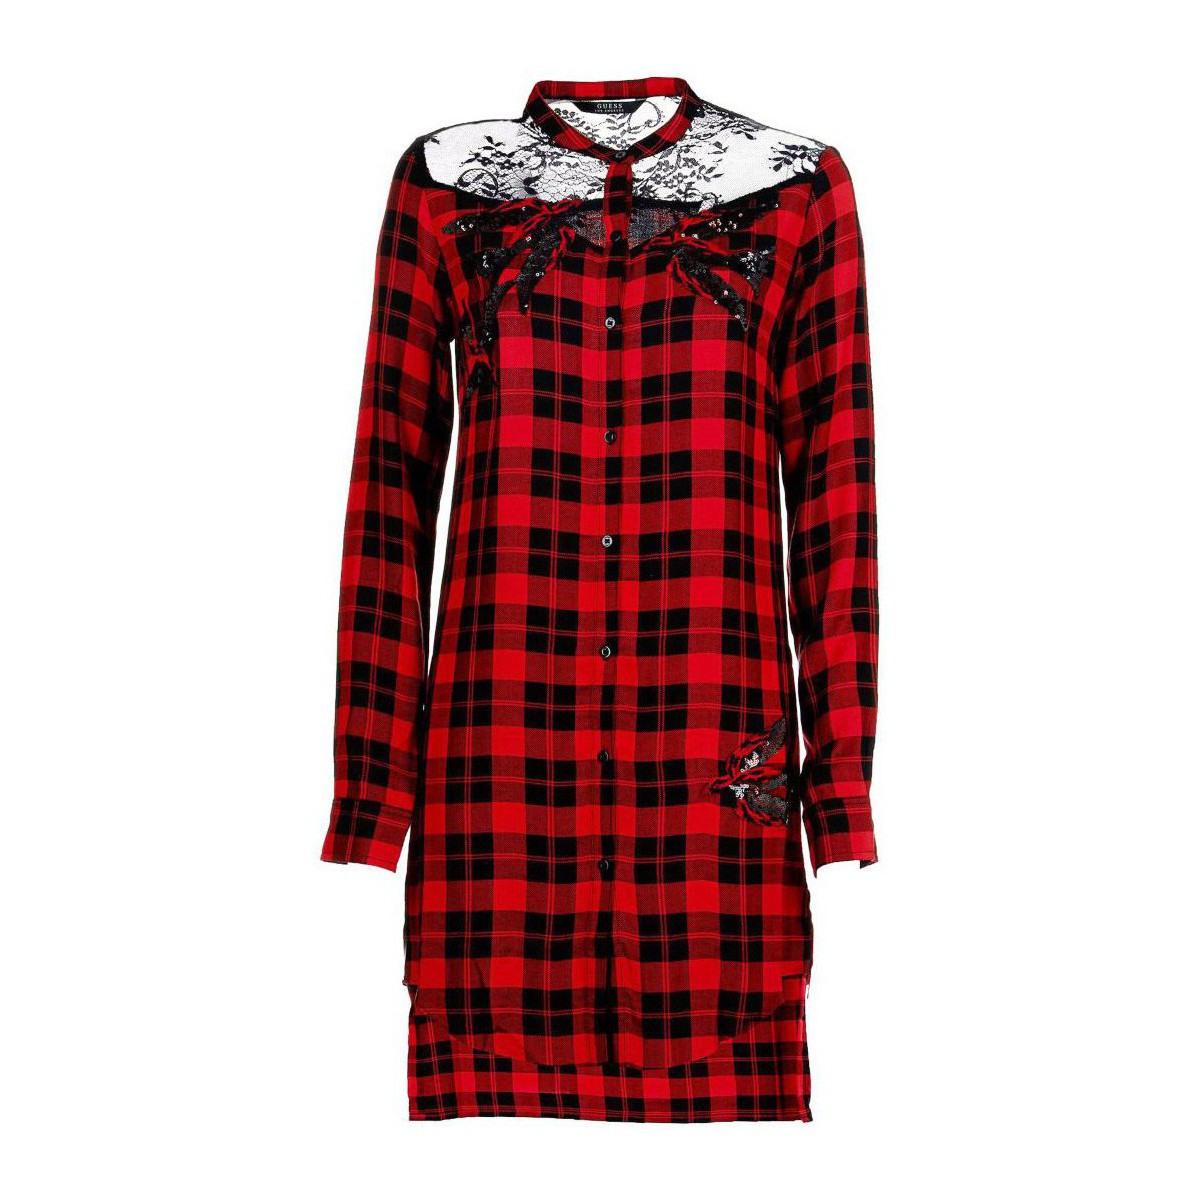 10 Schön Bordeaux Kleid SpezialgebietAbend Elegant Bordeaux Kleid Bester Preis